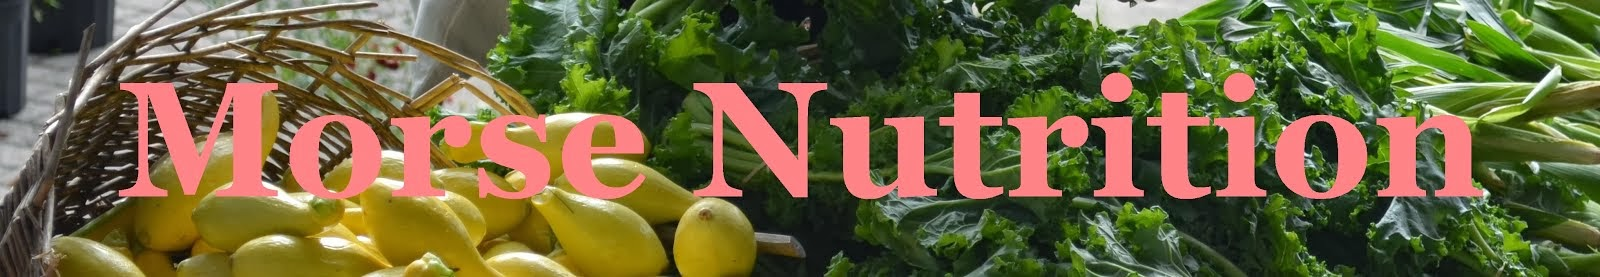 Morse Nutrition